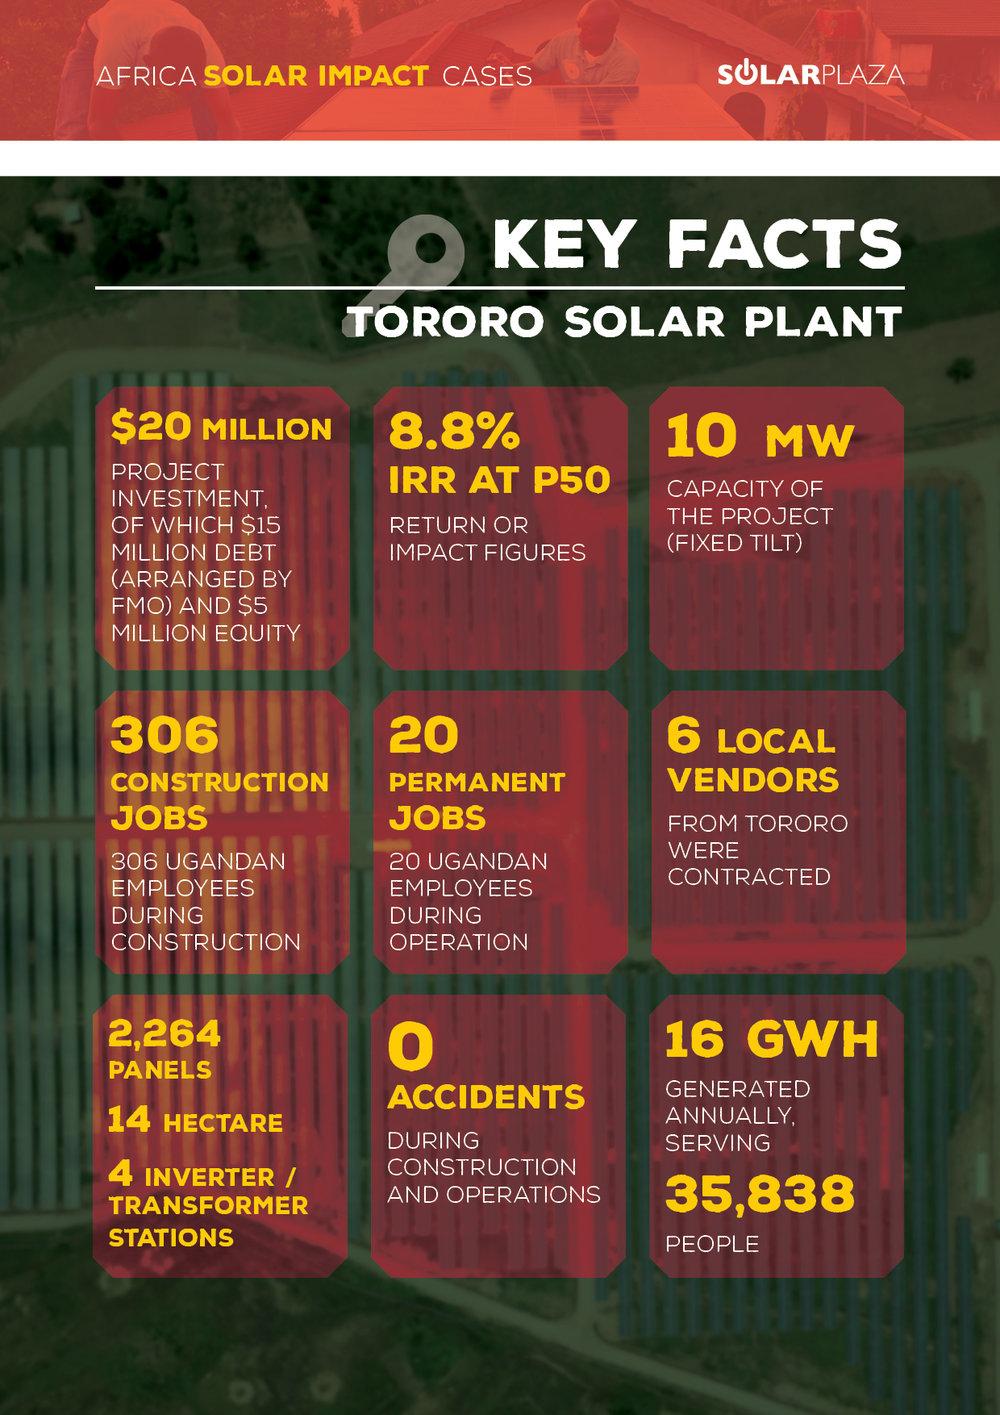 Africa Solar Impact Cases Report 1.0 (SRF)10.jpg